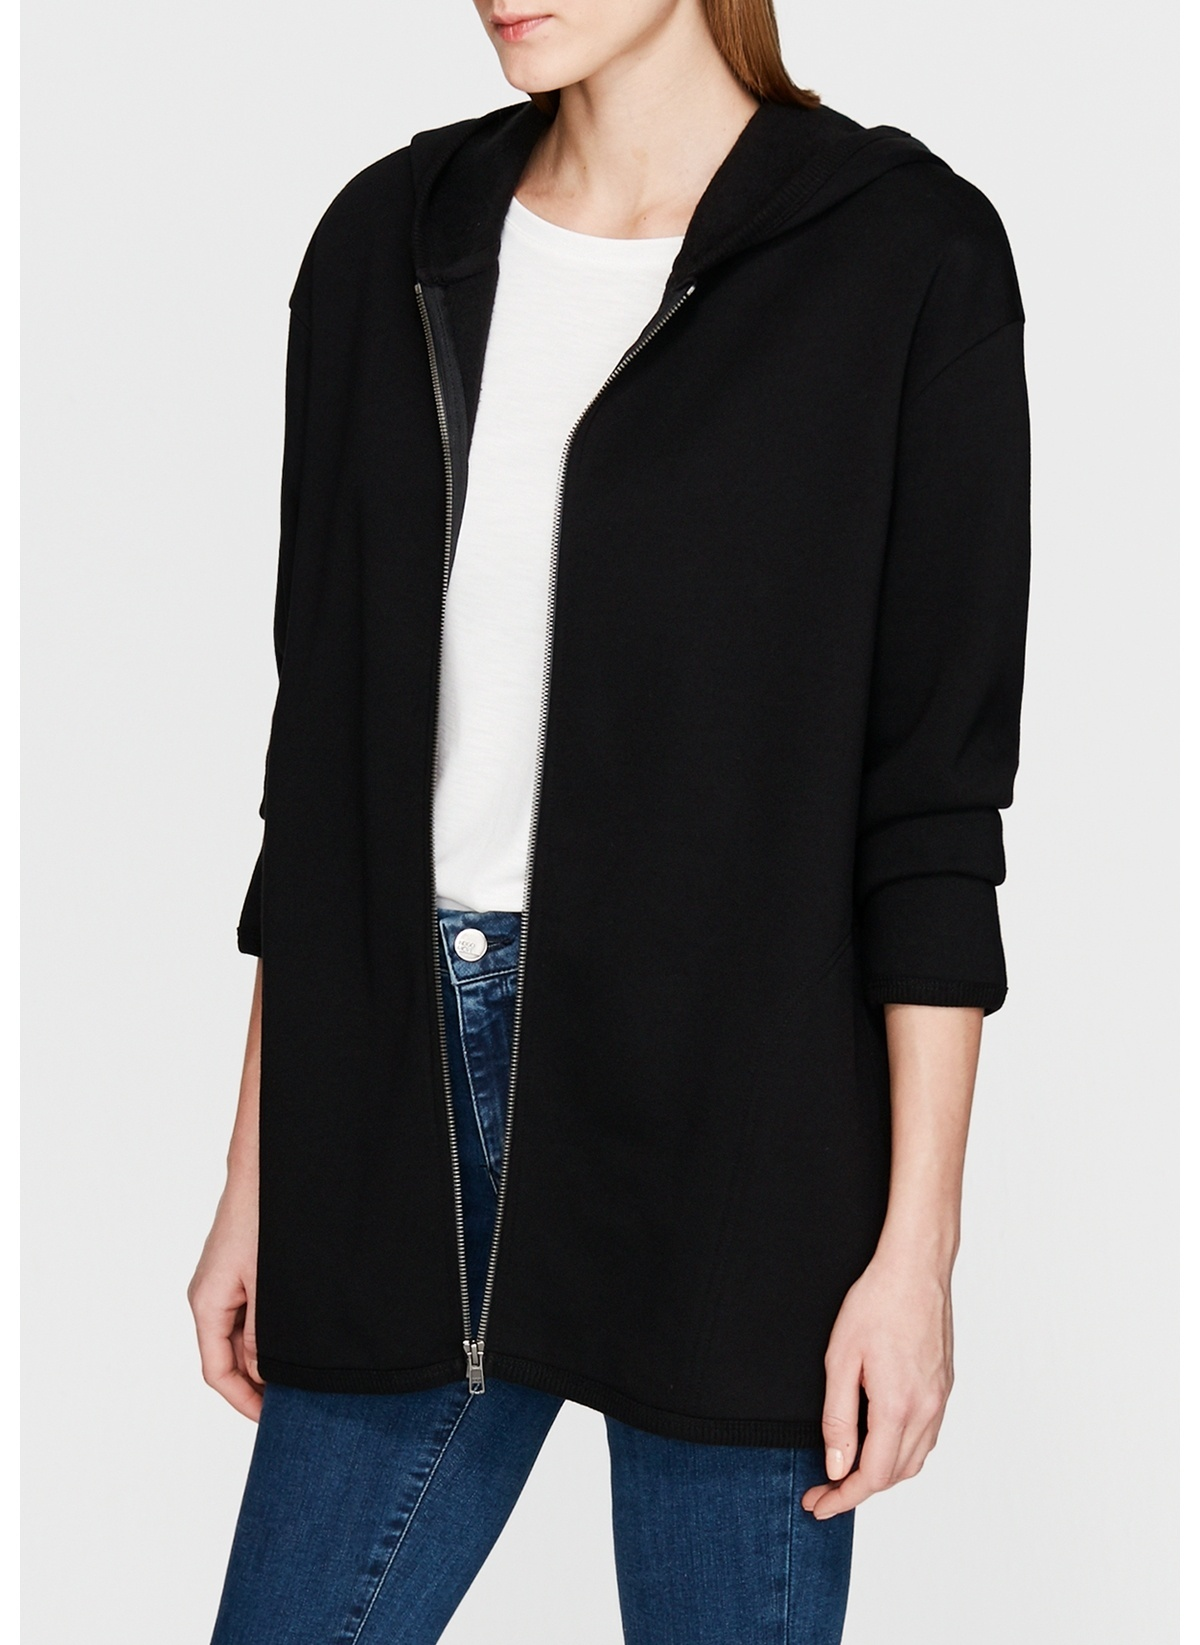 Mavi Fermuarlı Sweatshirt 167659-900 Fermuarlı Siyah Sweatshirt – 149.99 TL